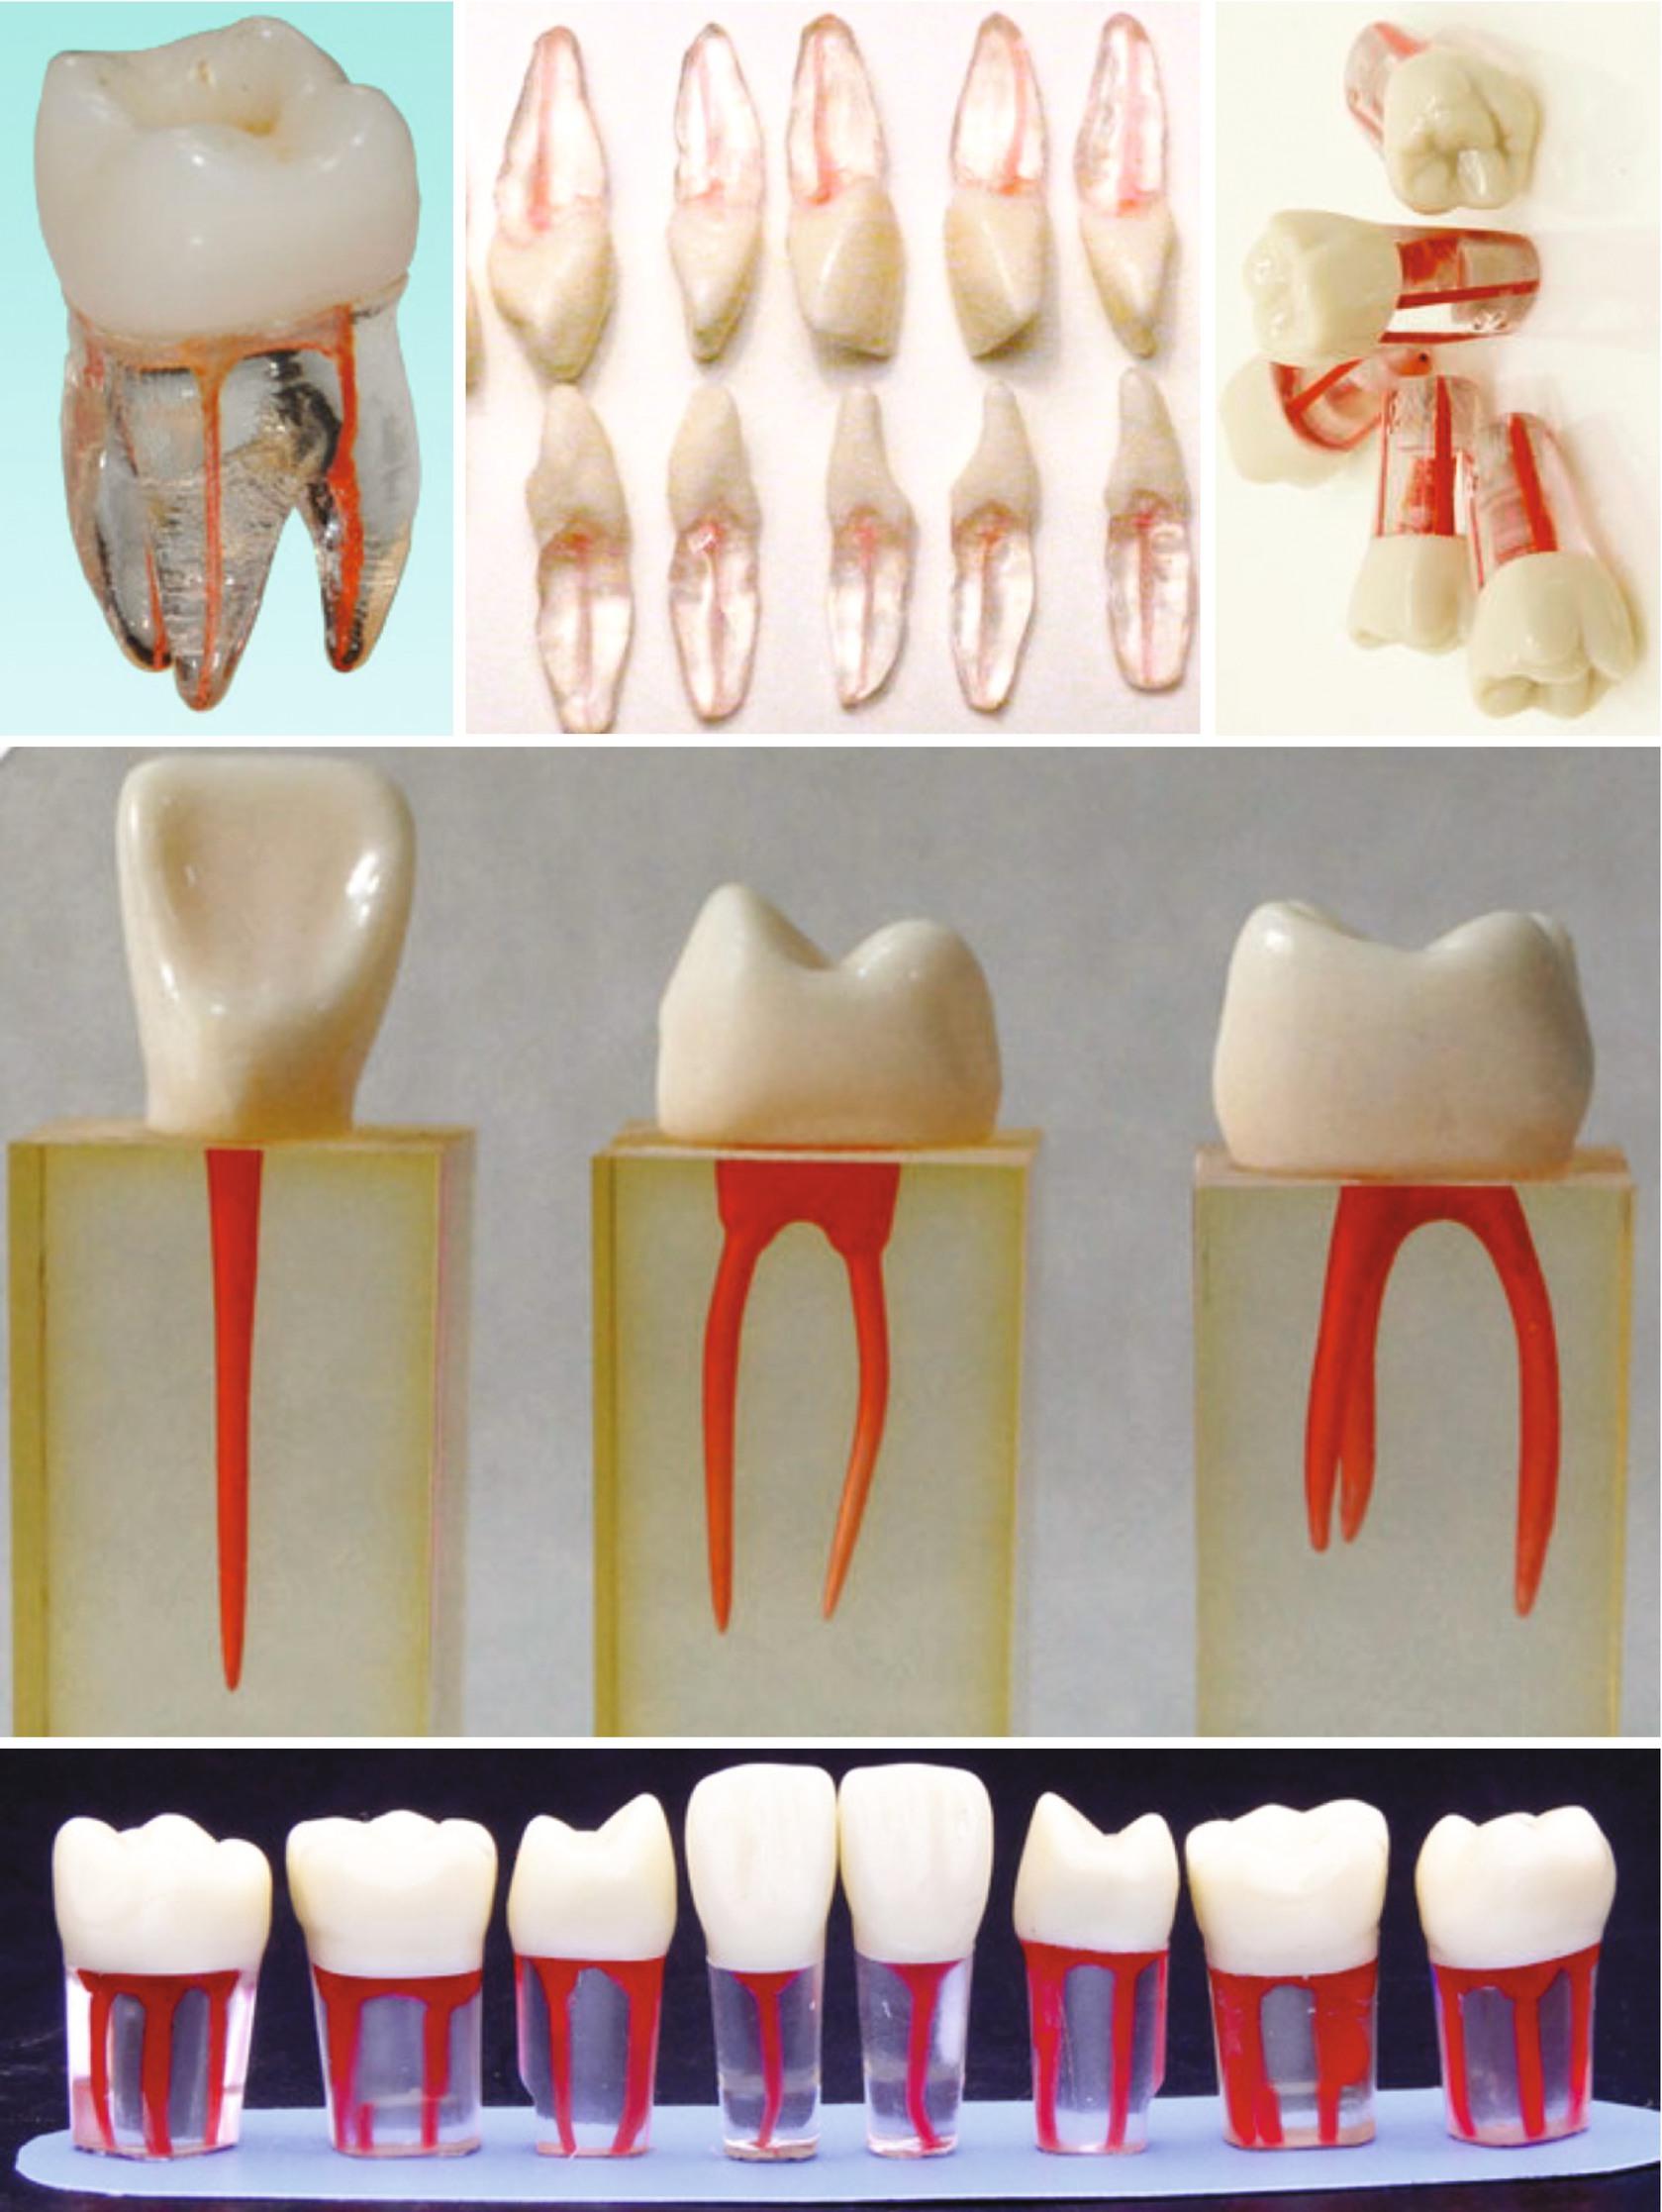 Contemporary Strategies for Teaching Internal Anatomy of Teeth ...